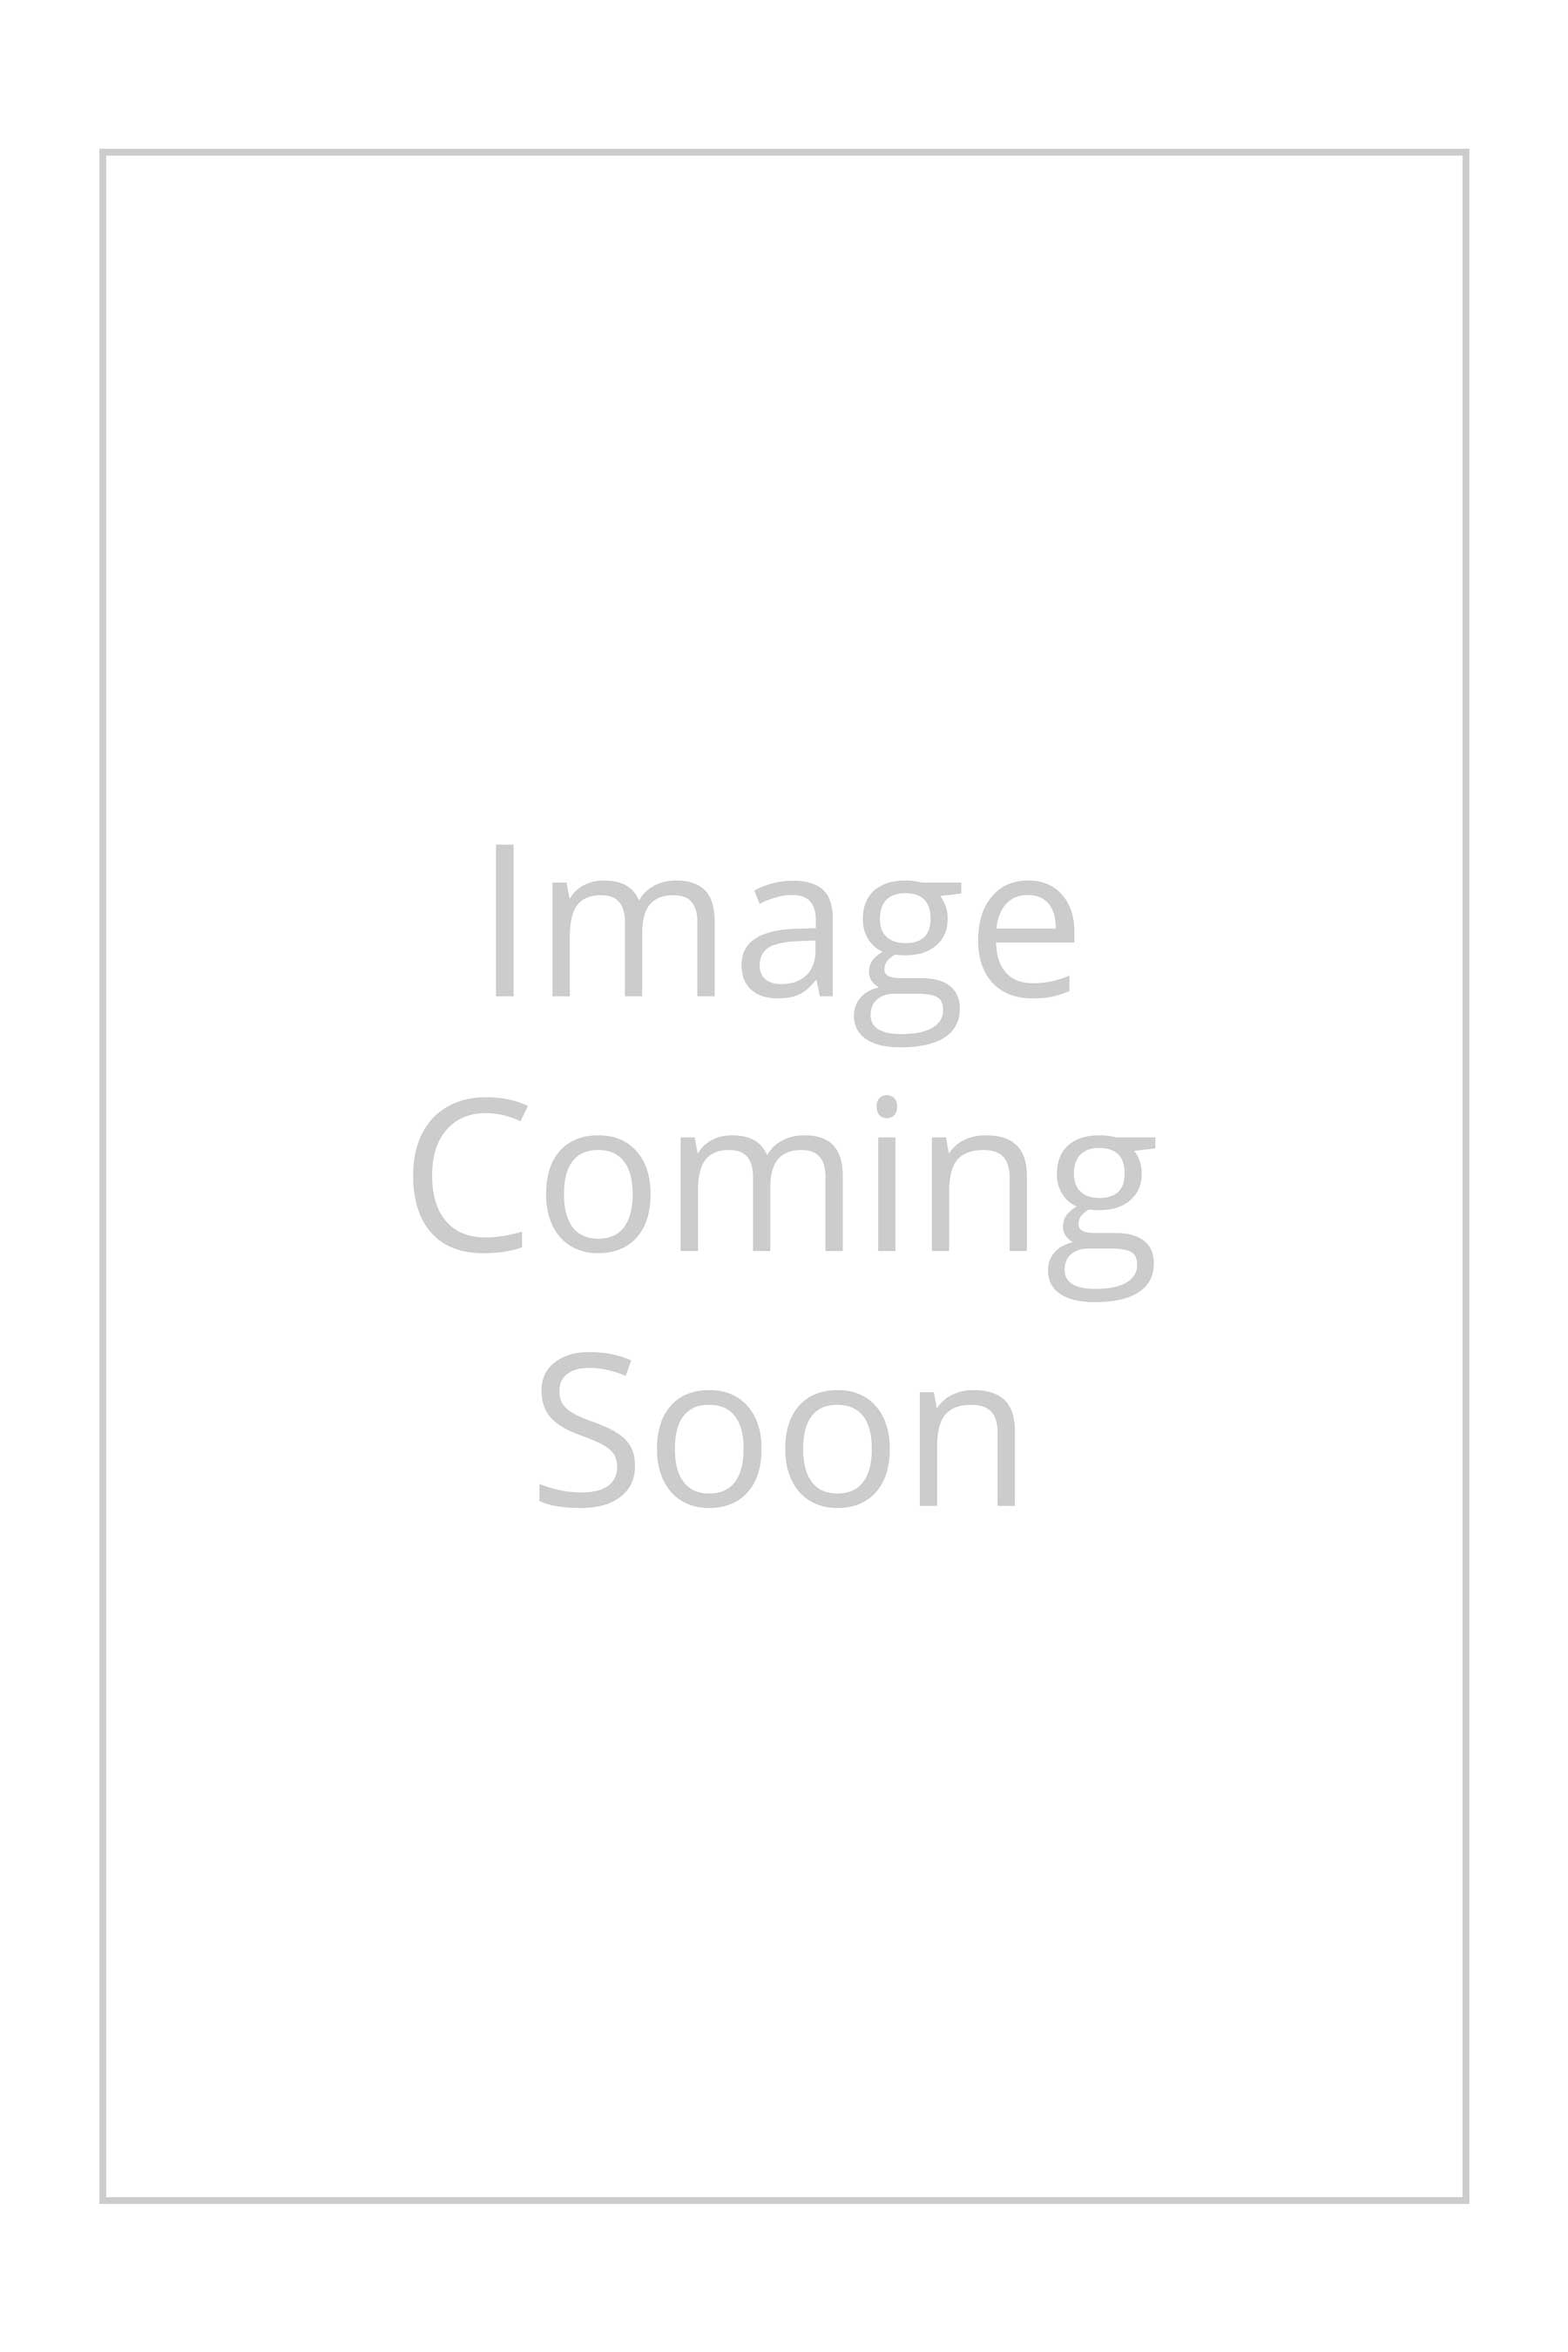 St John V-Neck Sleeveless Santana Knit Top in Black